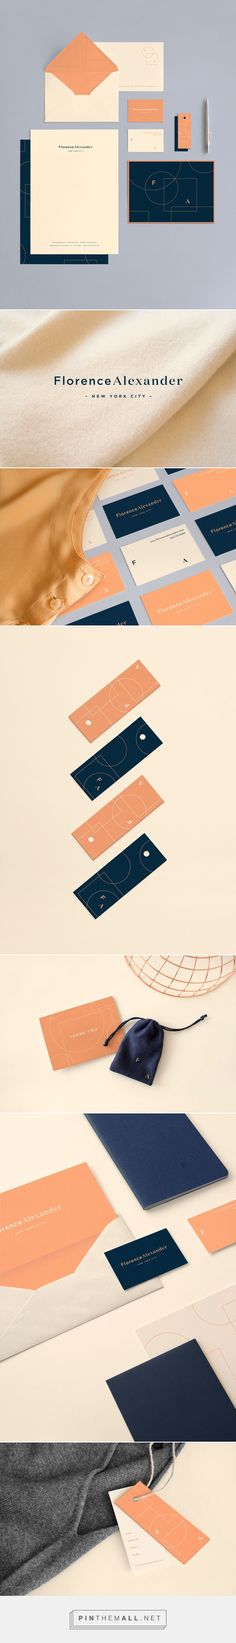 Florence Alexander on Behance | Fivestar Branding – Design and Branding Agency & Inspiration Gallery